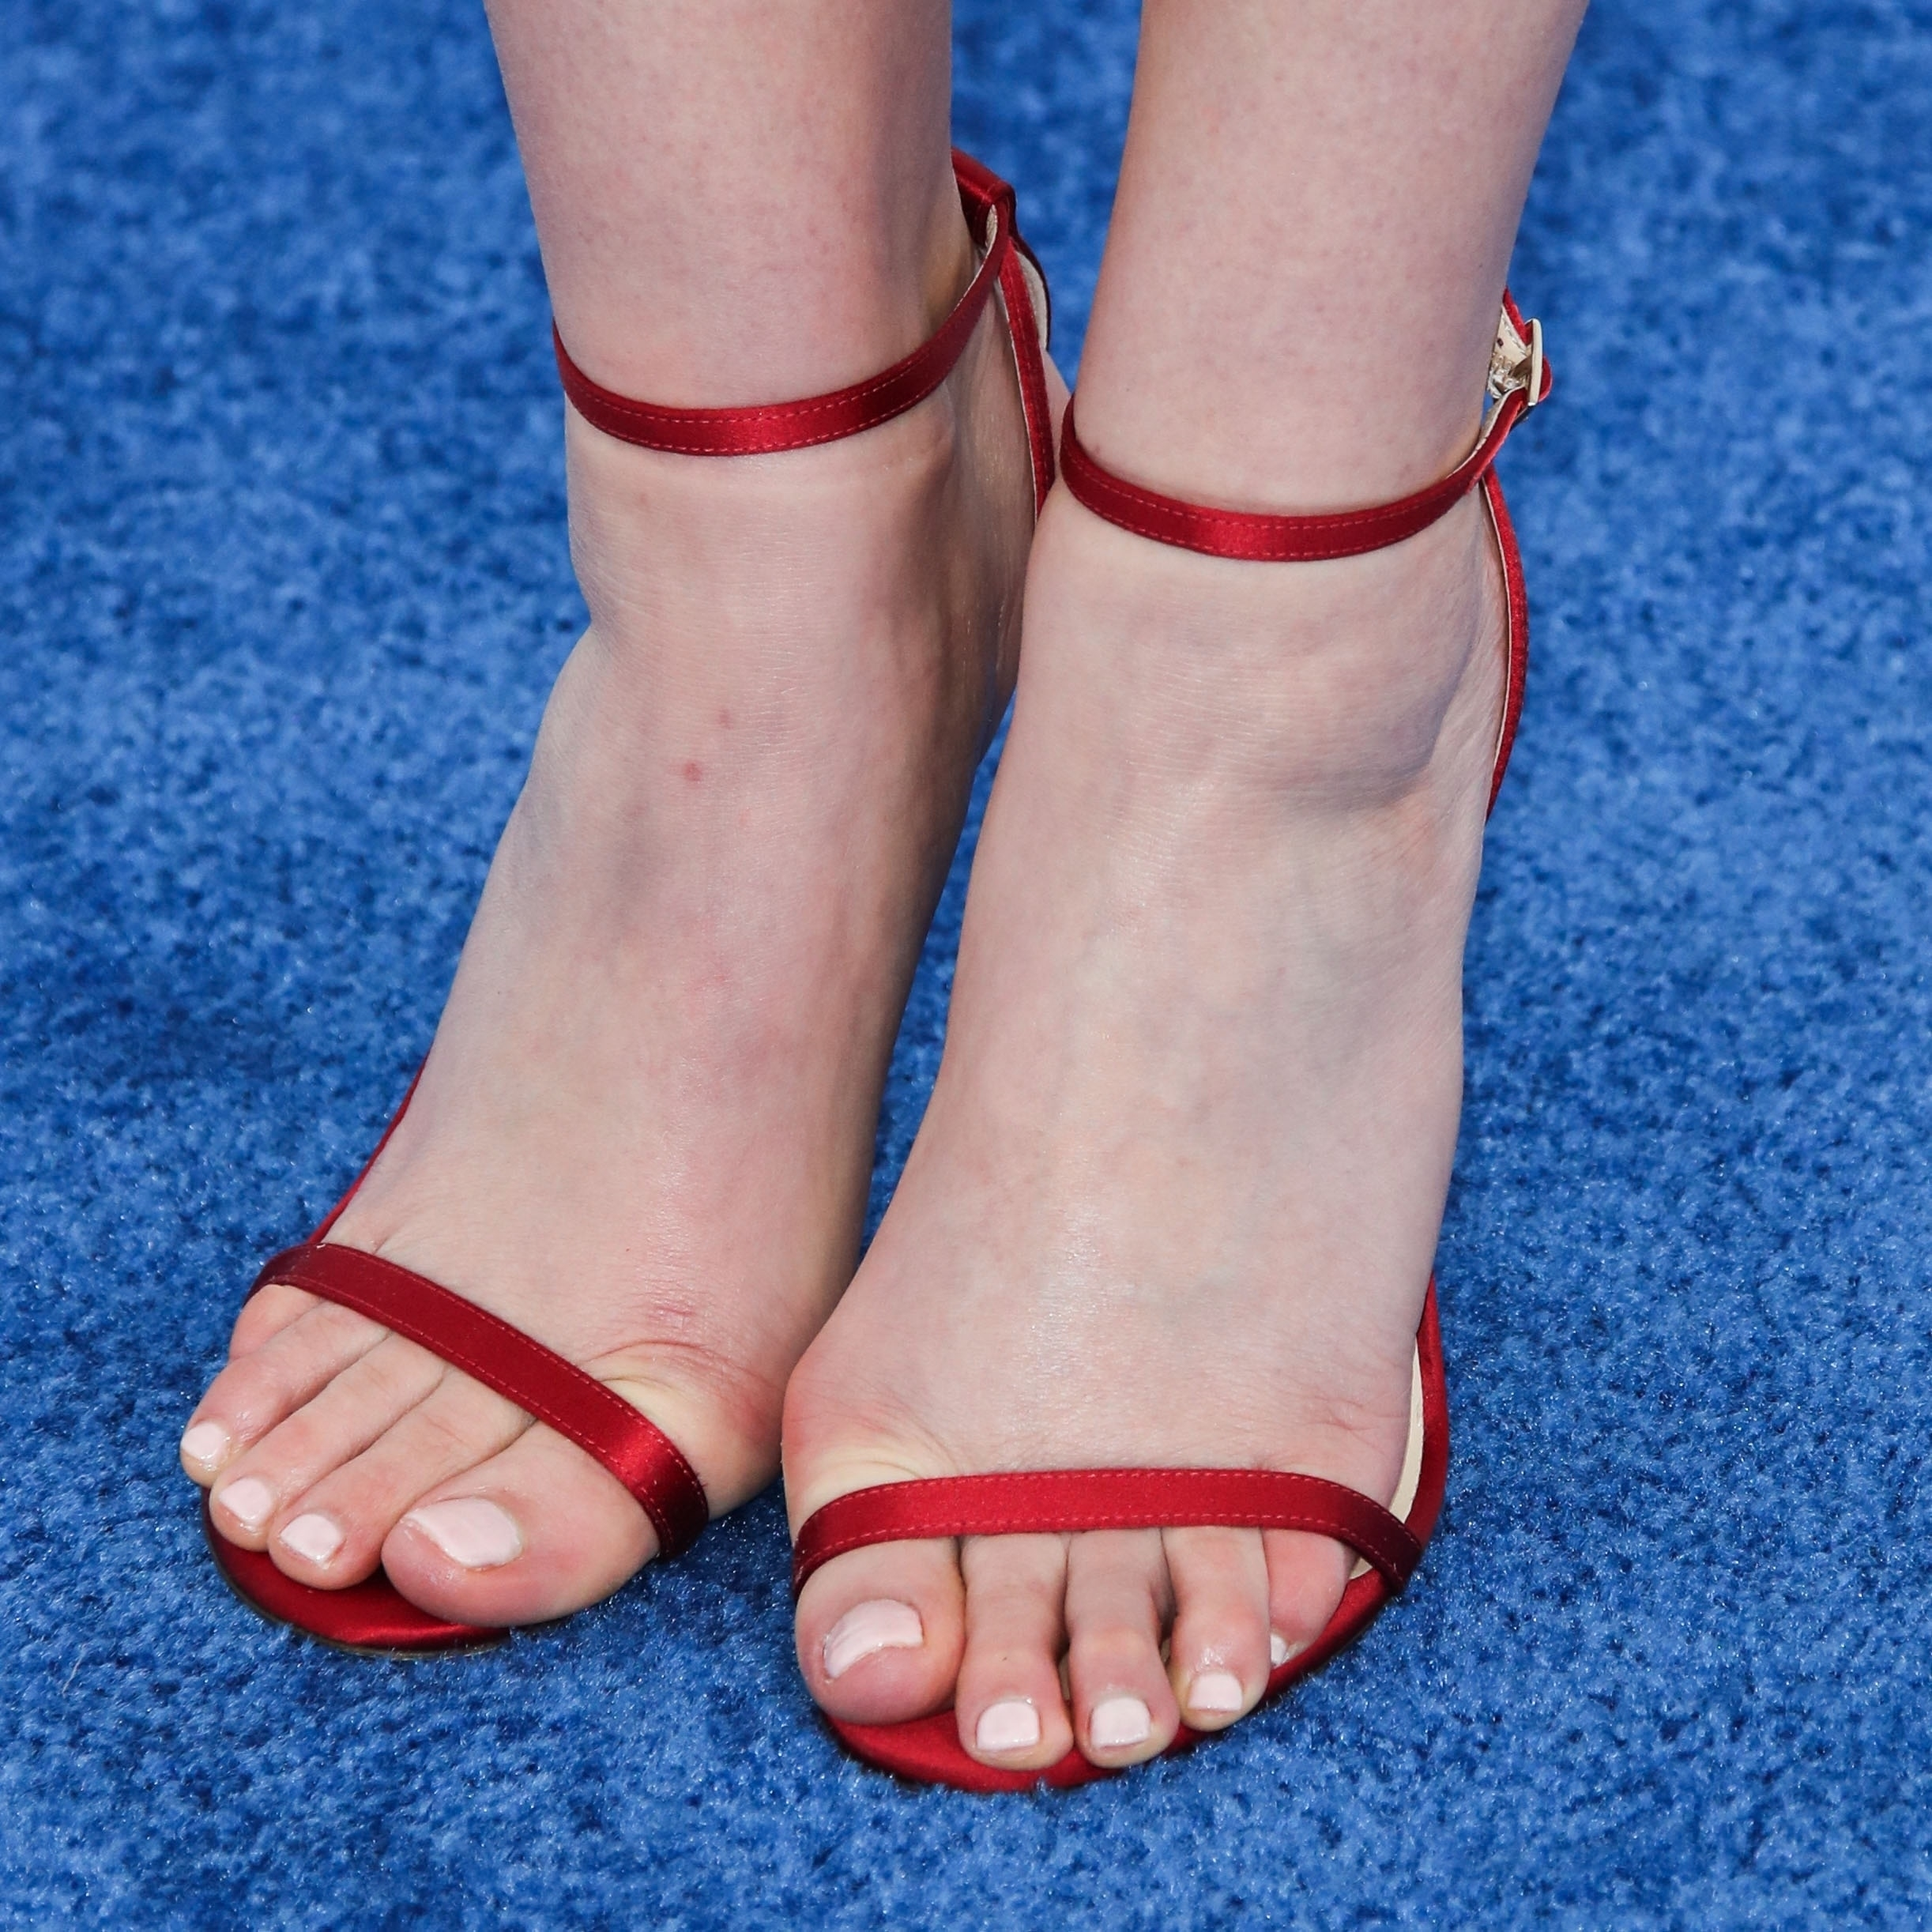 Foot tease and elizabeth